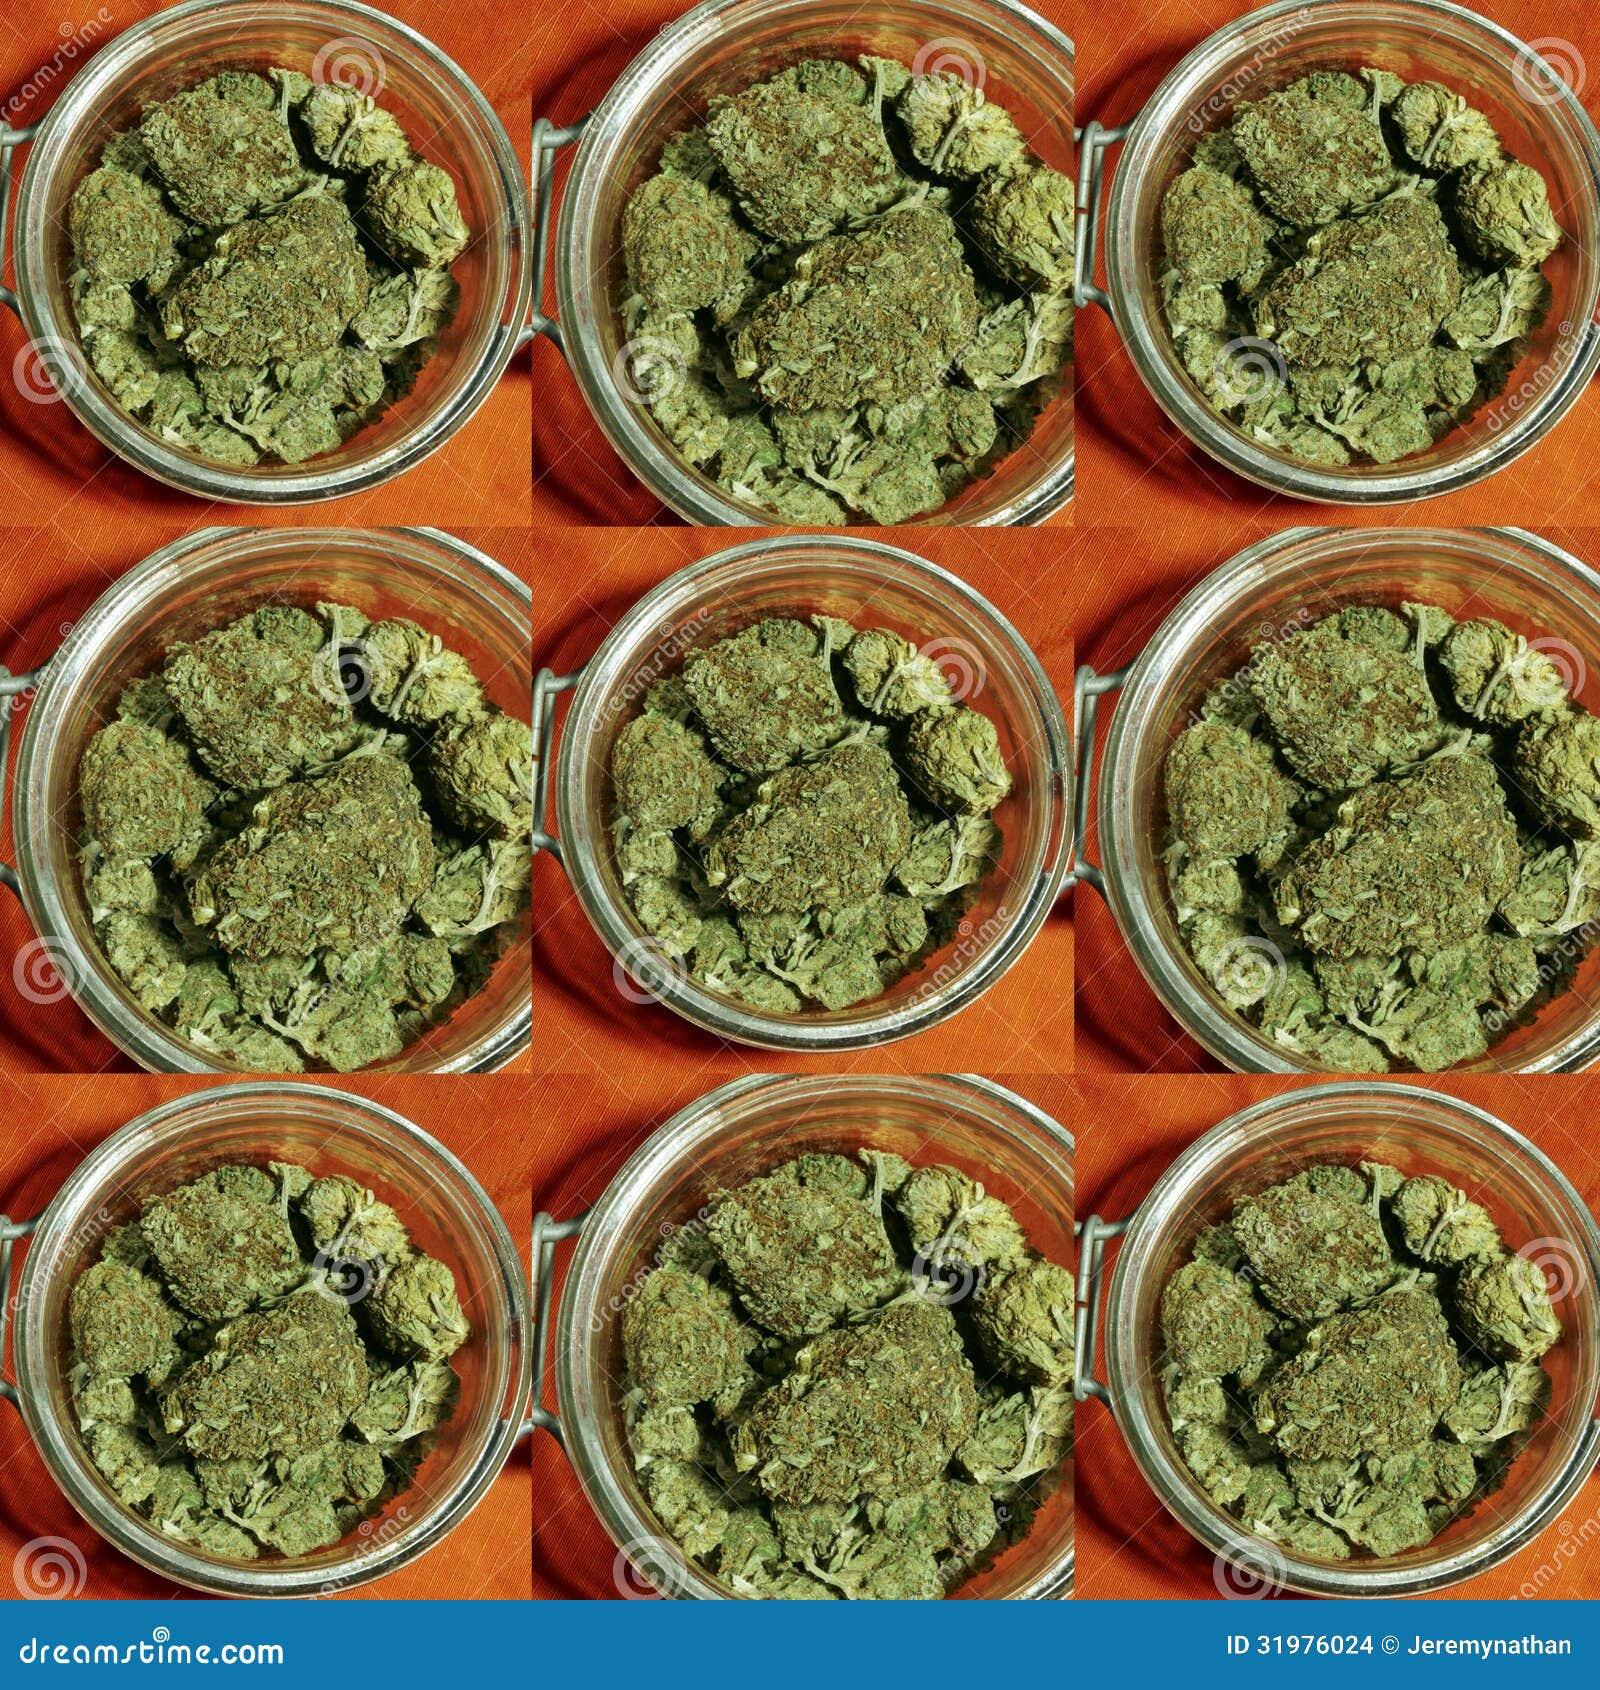 Marihuana RX